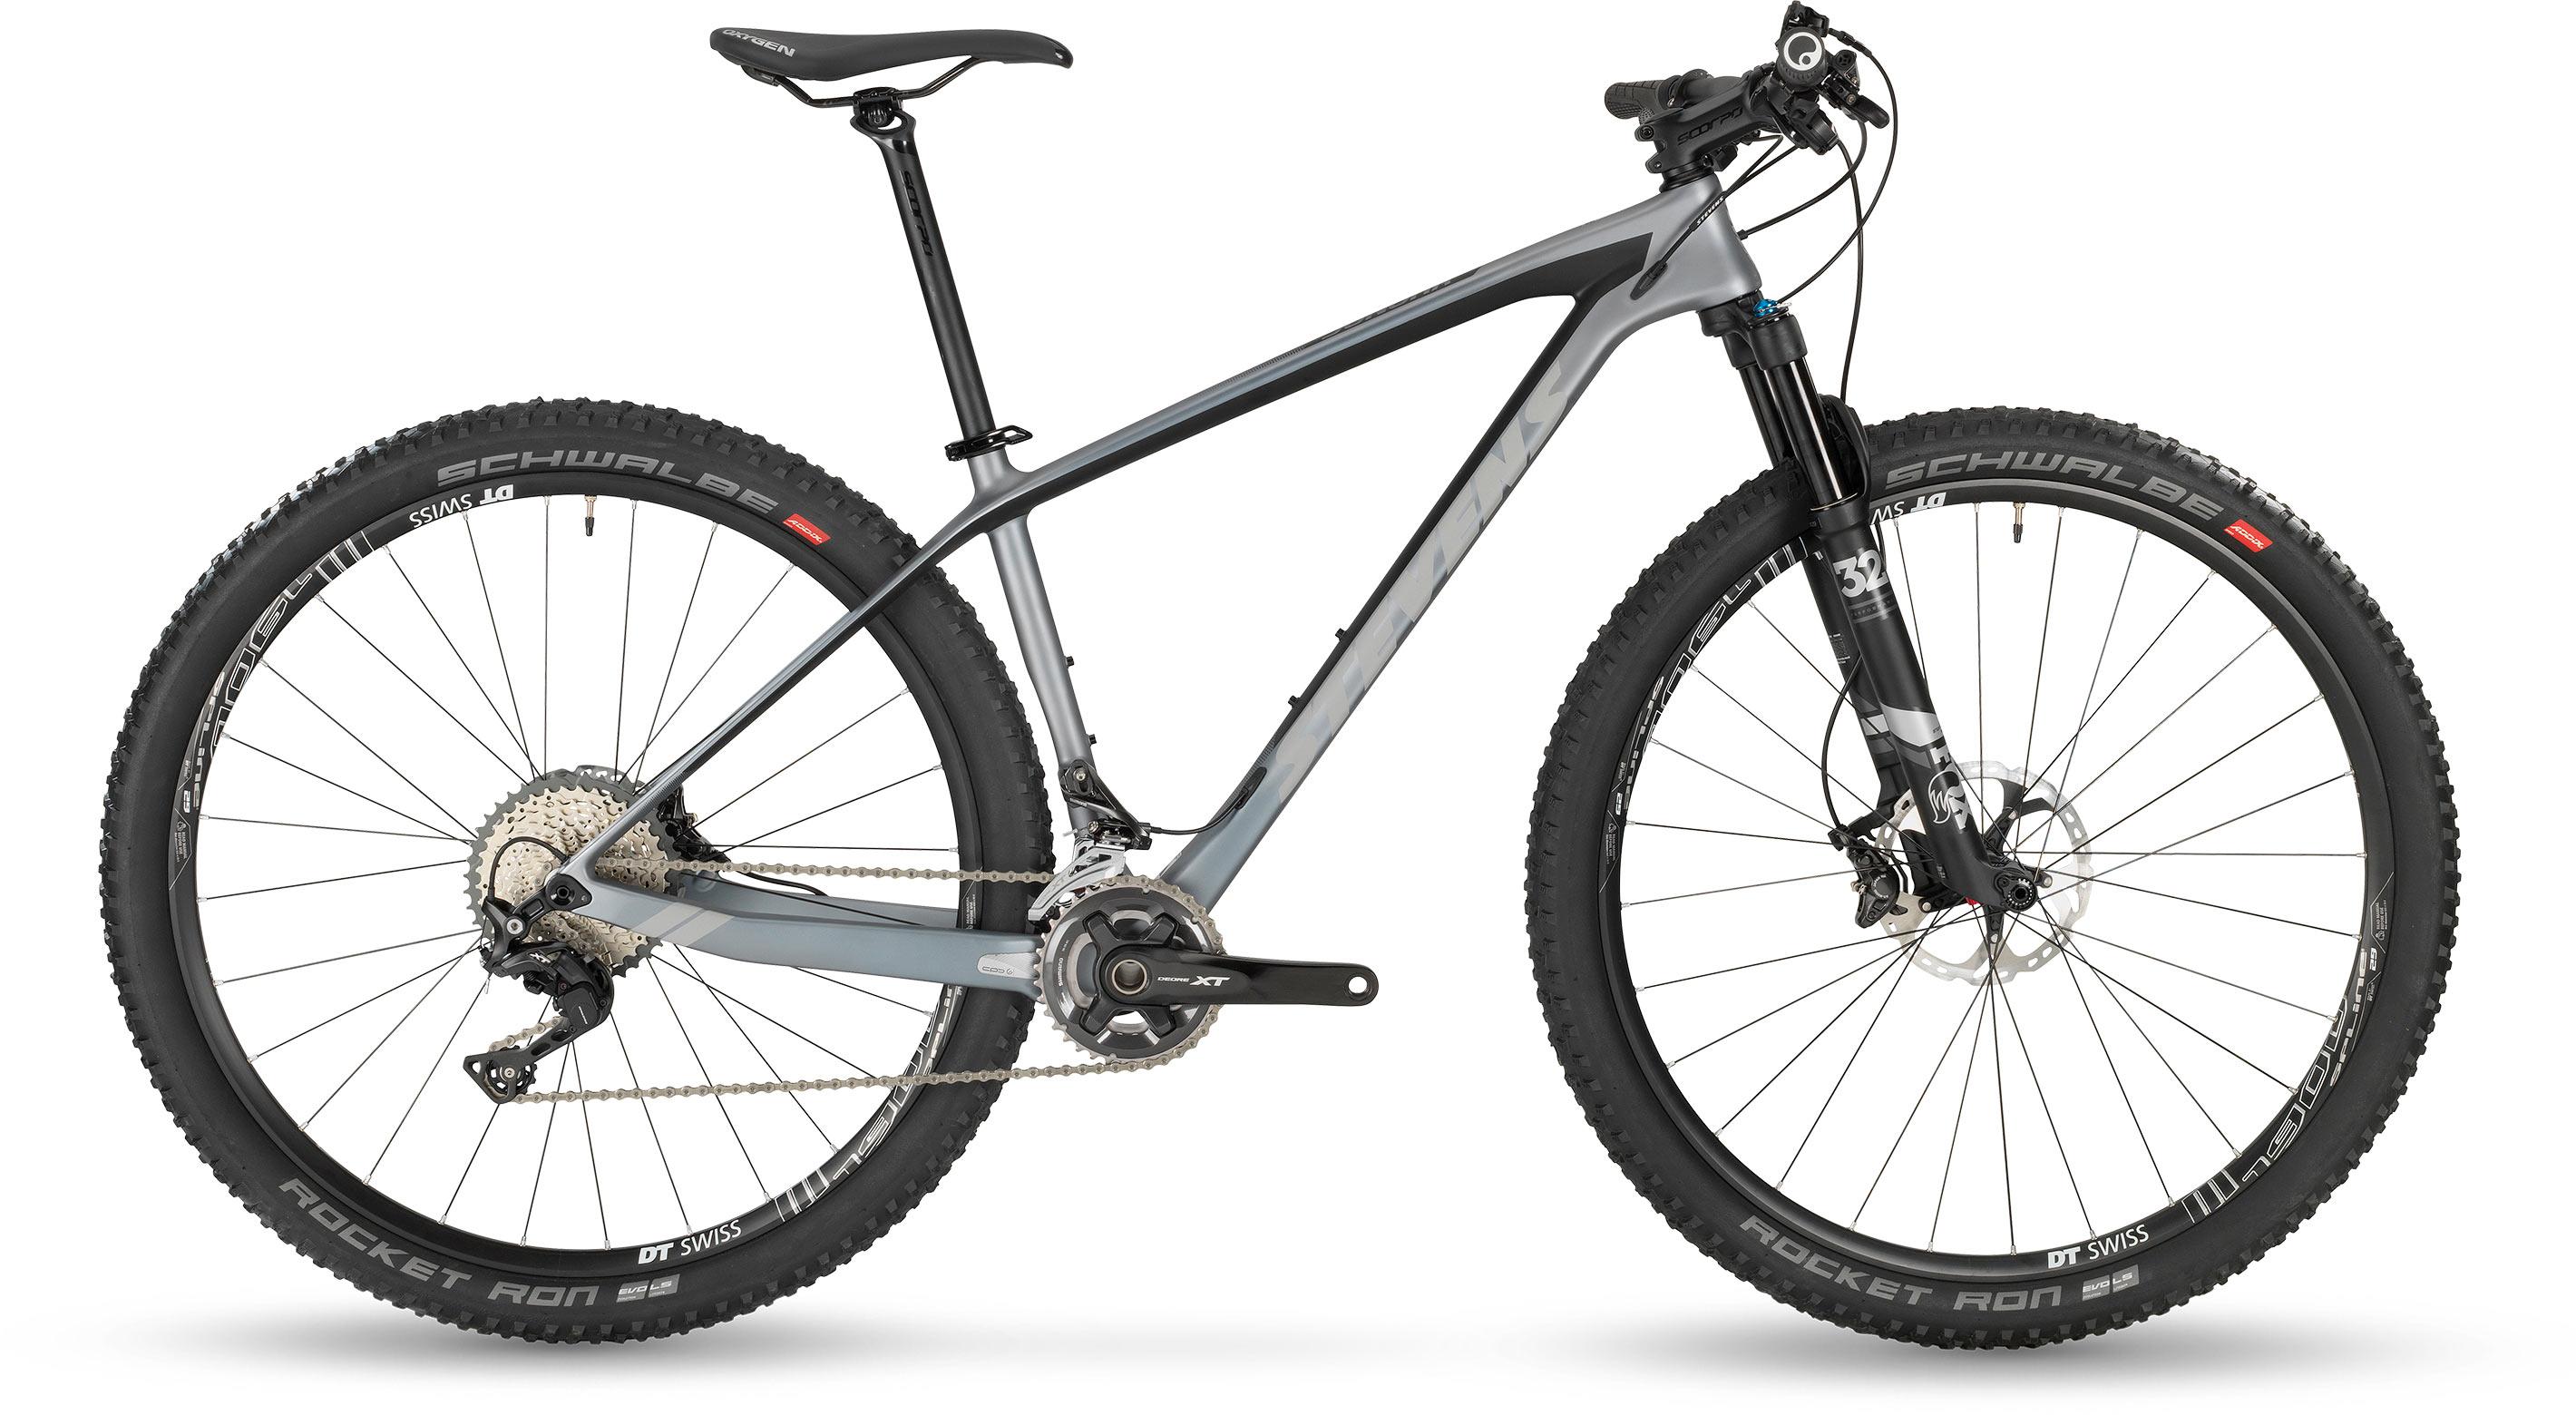 Sonora ES - Stevens Bikes 2018